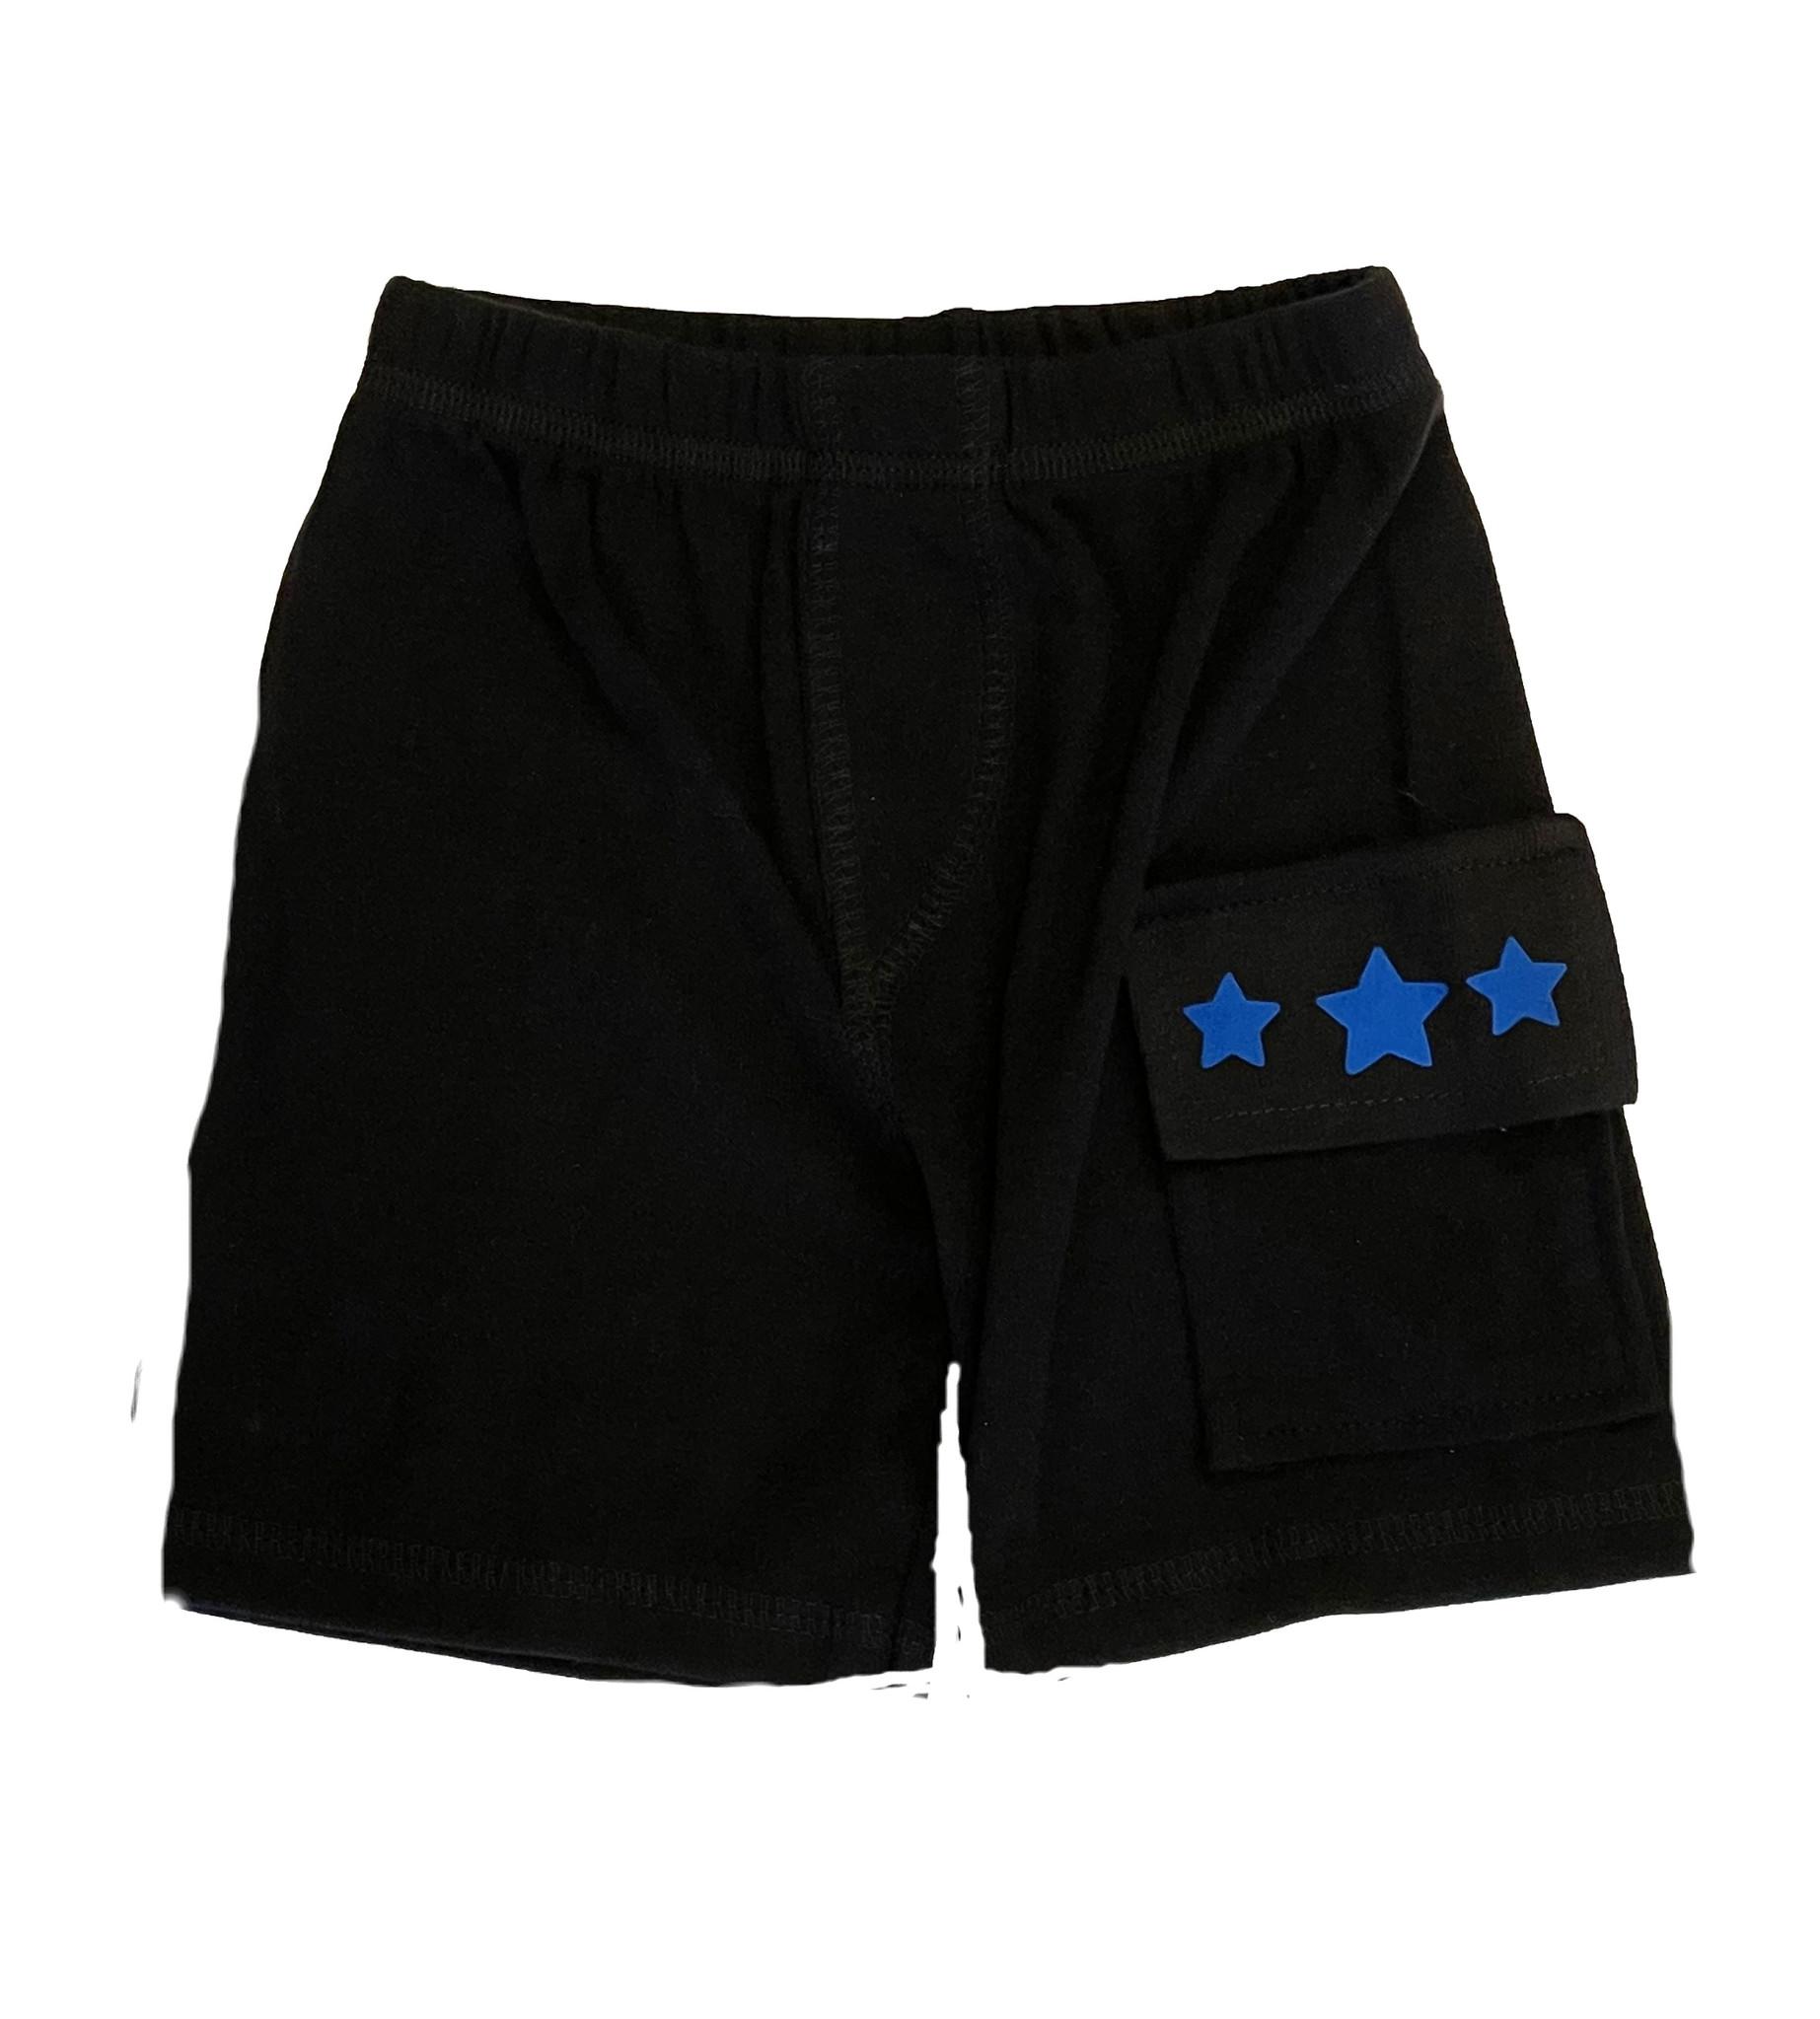 Small Change Blue Star Pocket Shorts